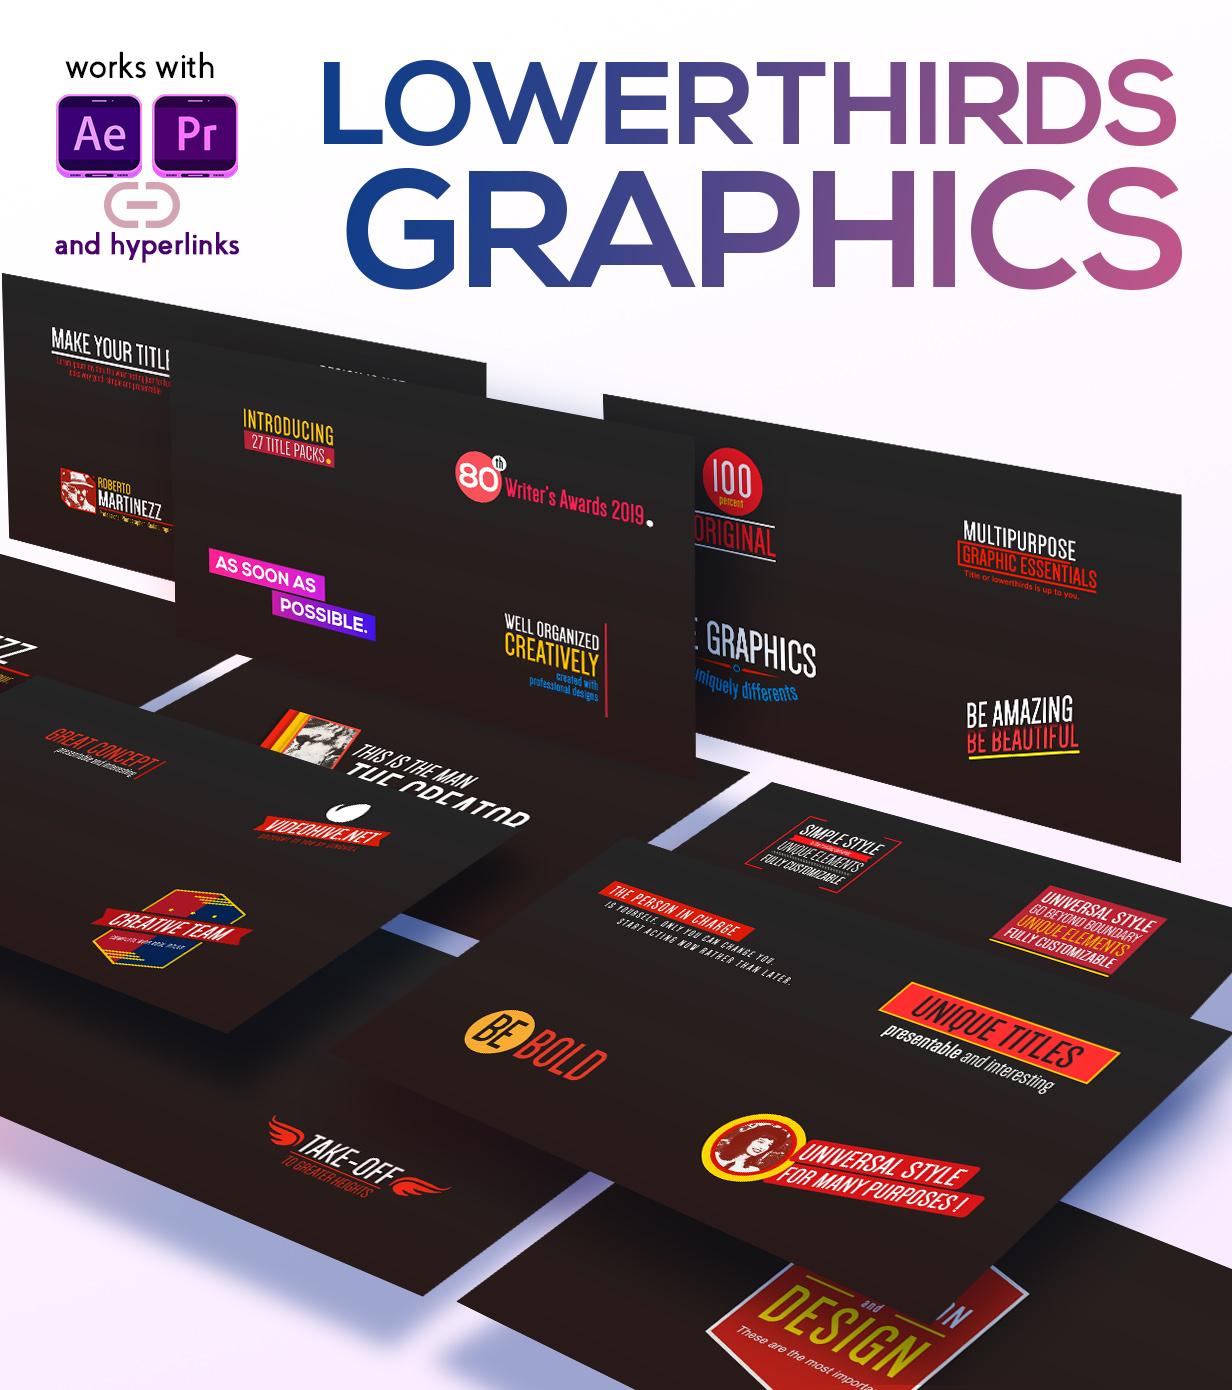 The Graphics - 5